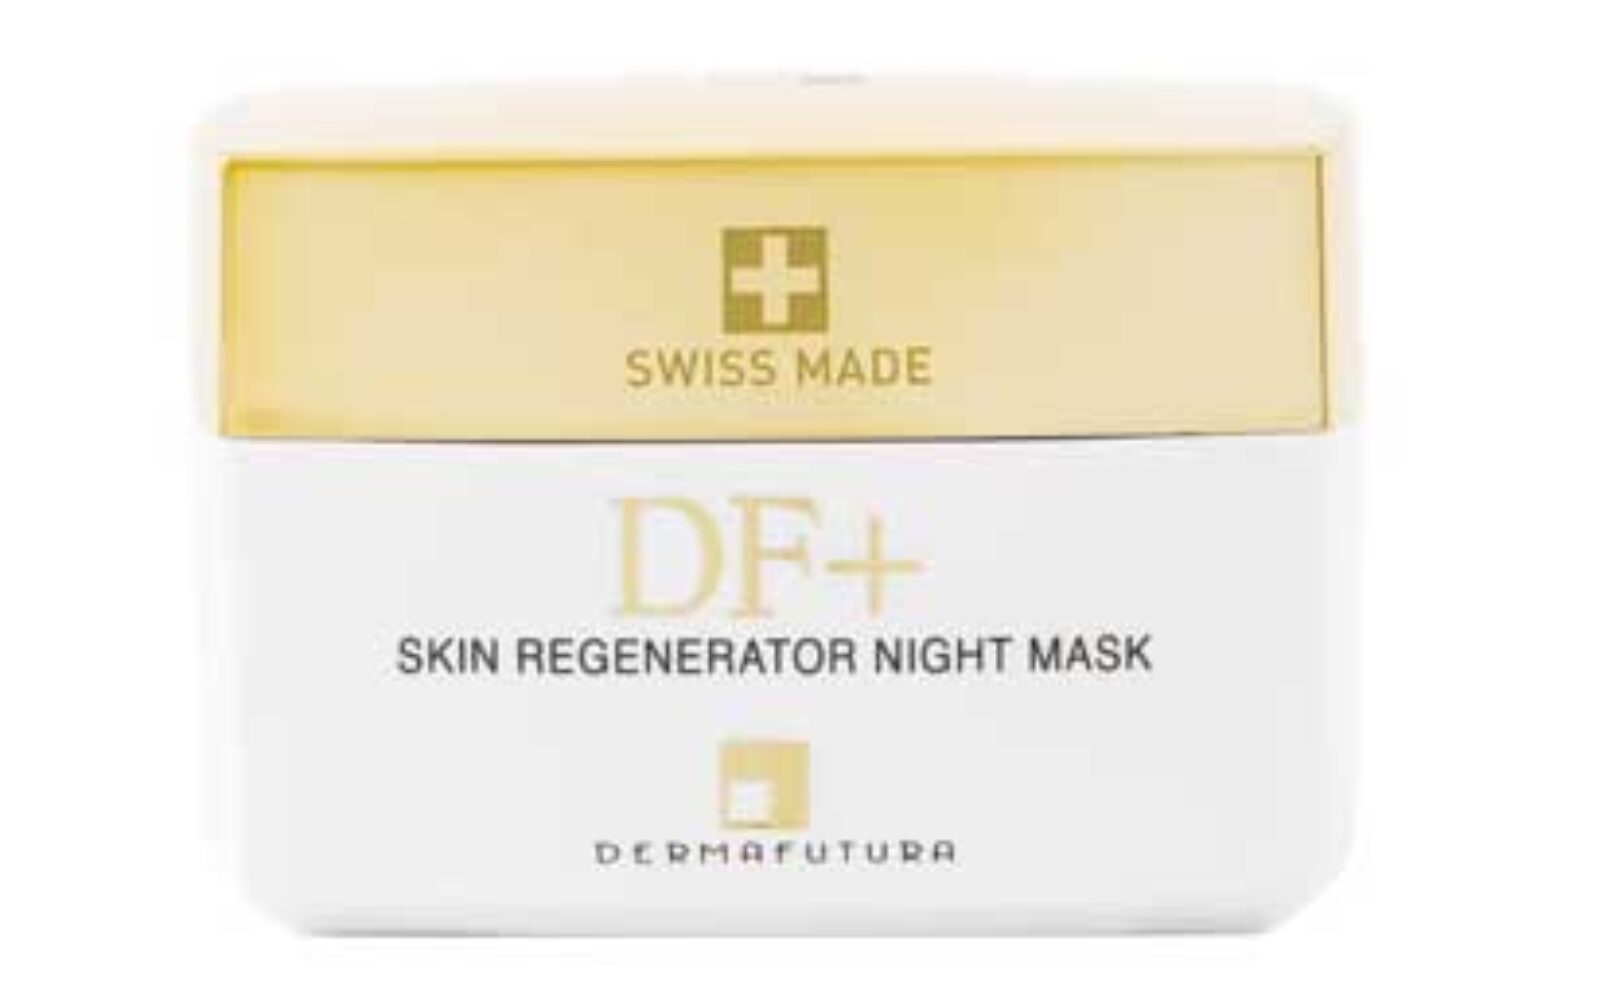 Maschera rigenerante notte